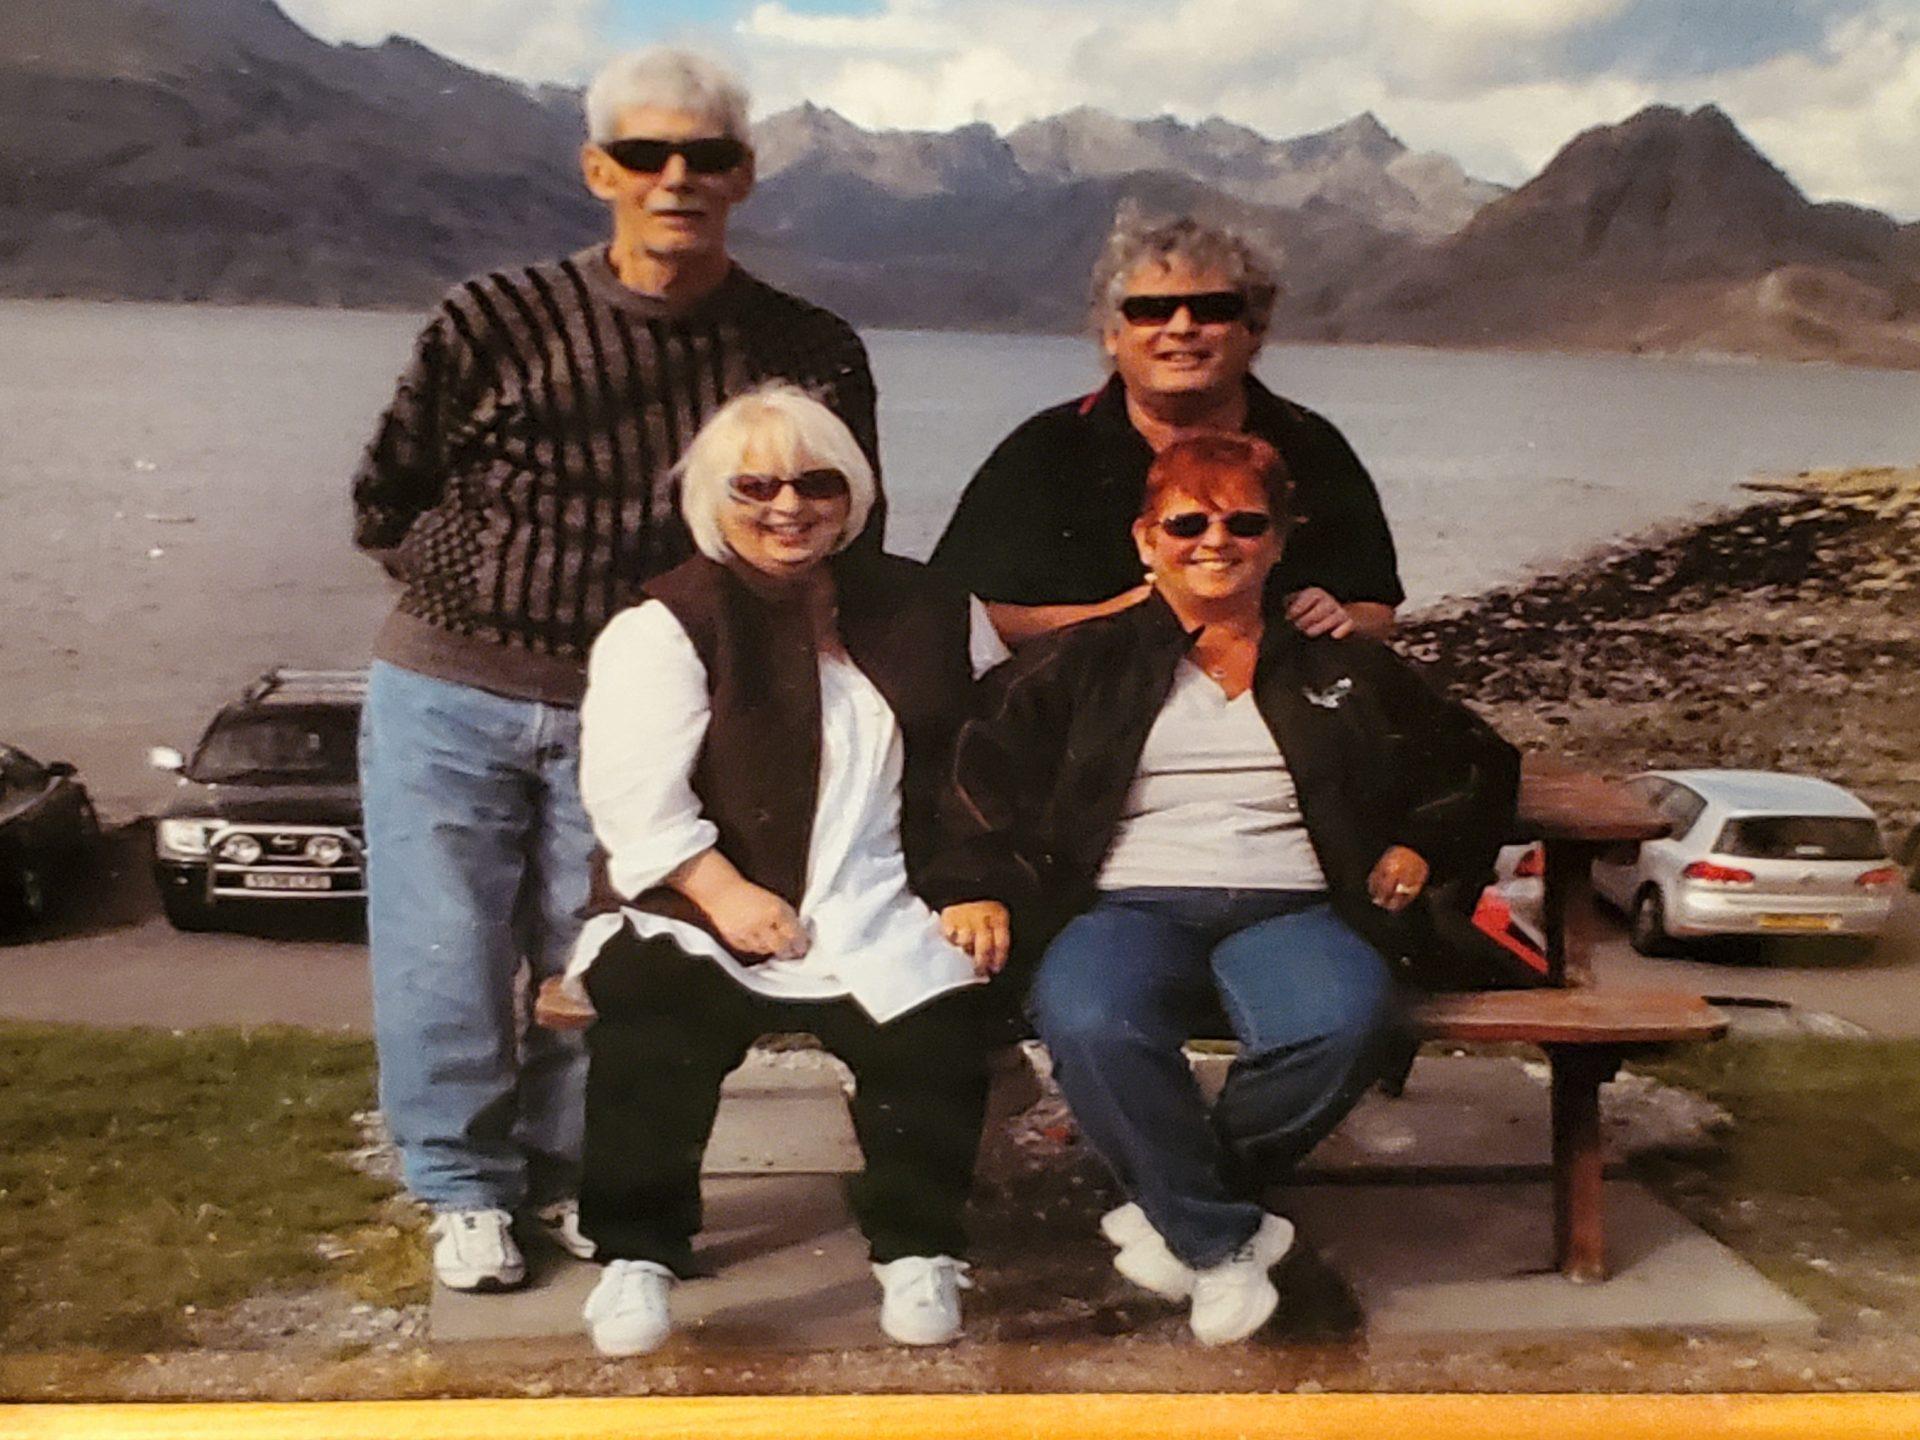 Our trip to Scotland